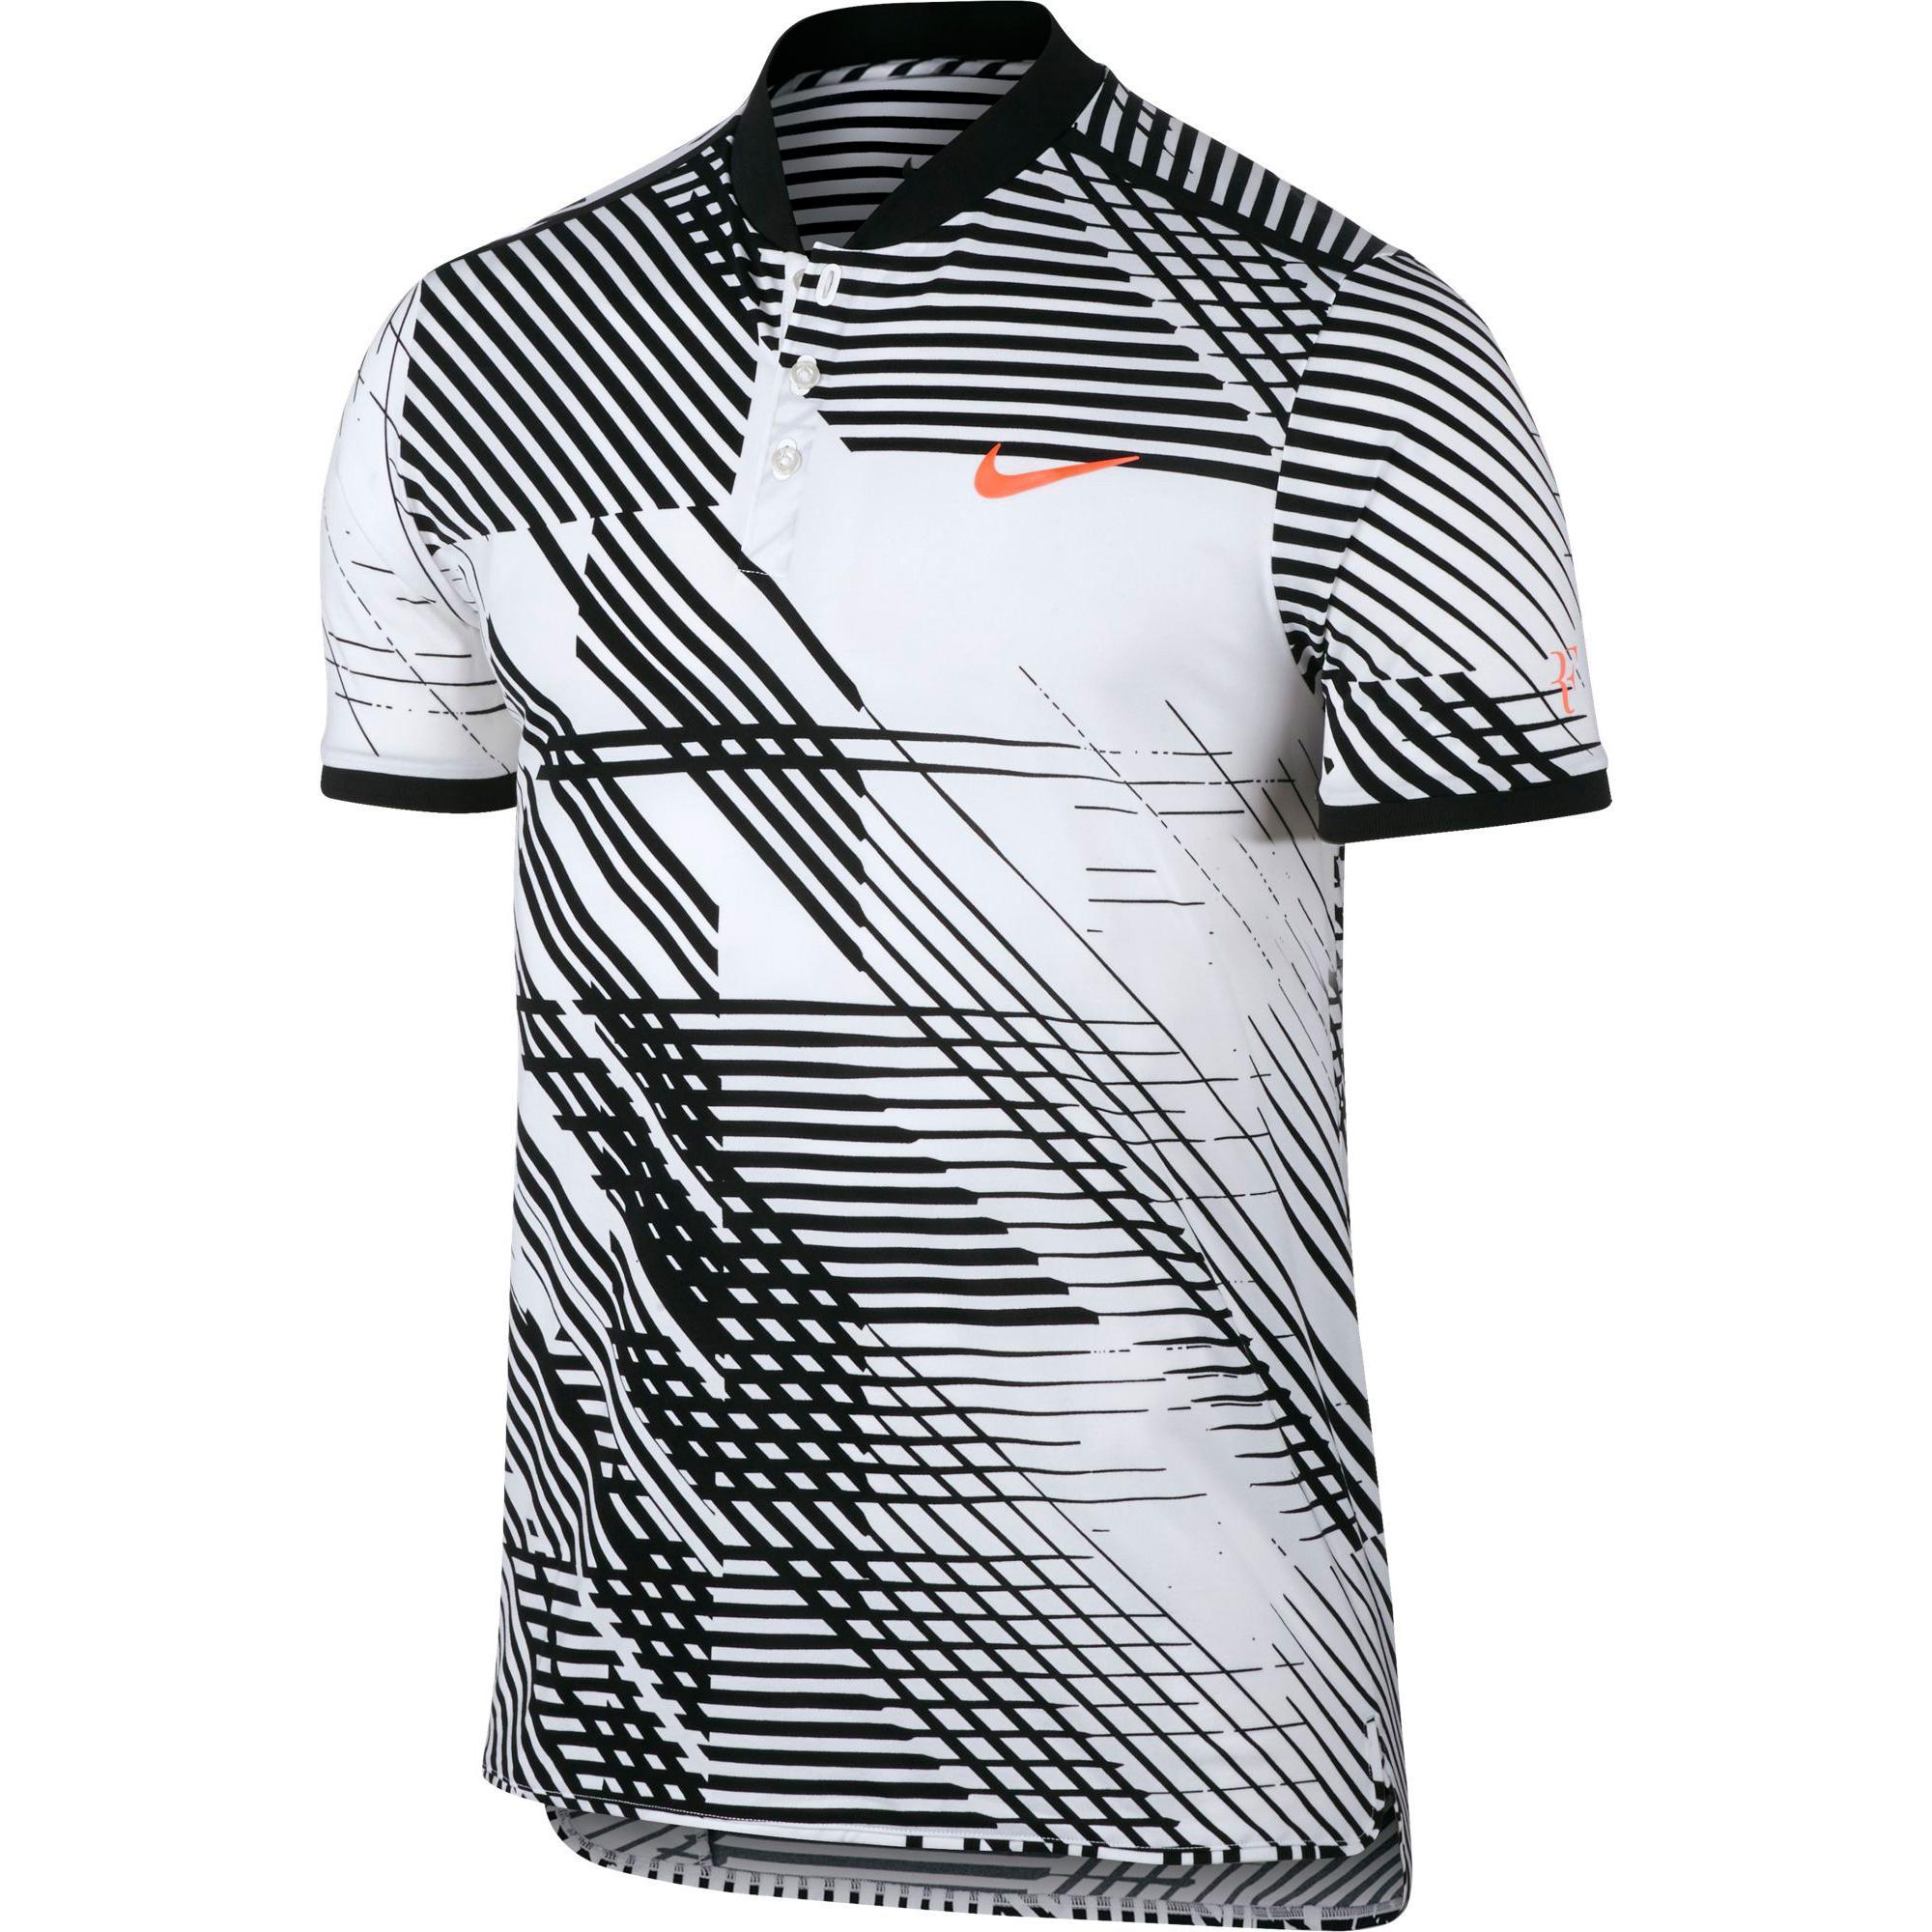 dcd85d560ec Nike Mens RF Advantage Tennis Polo - White Black - Tennisnuts.com